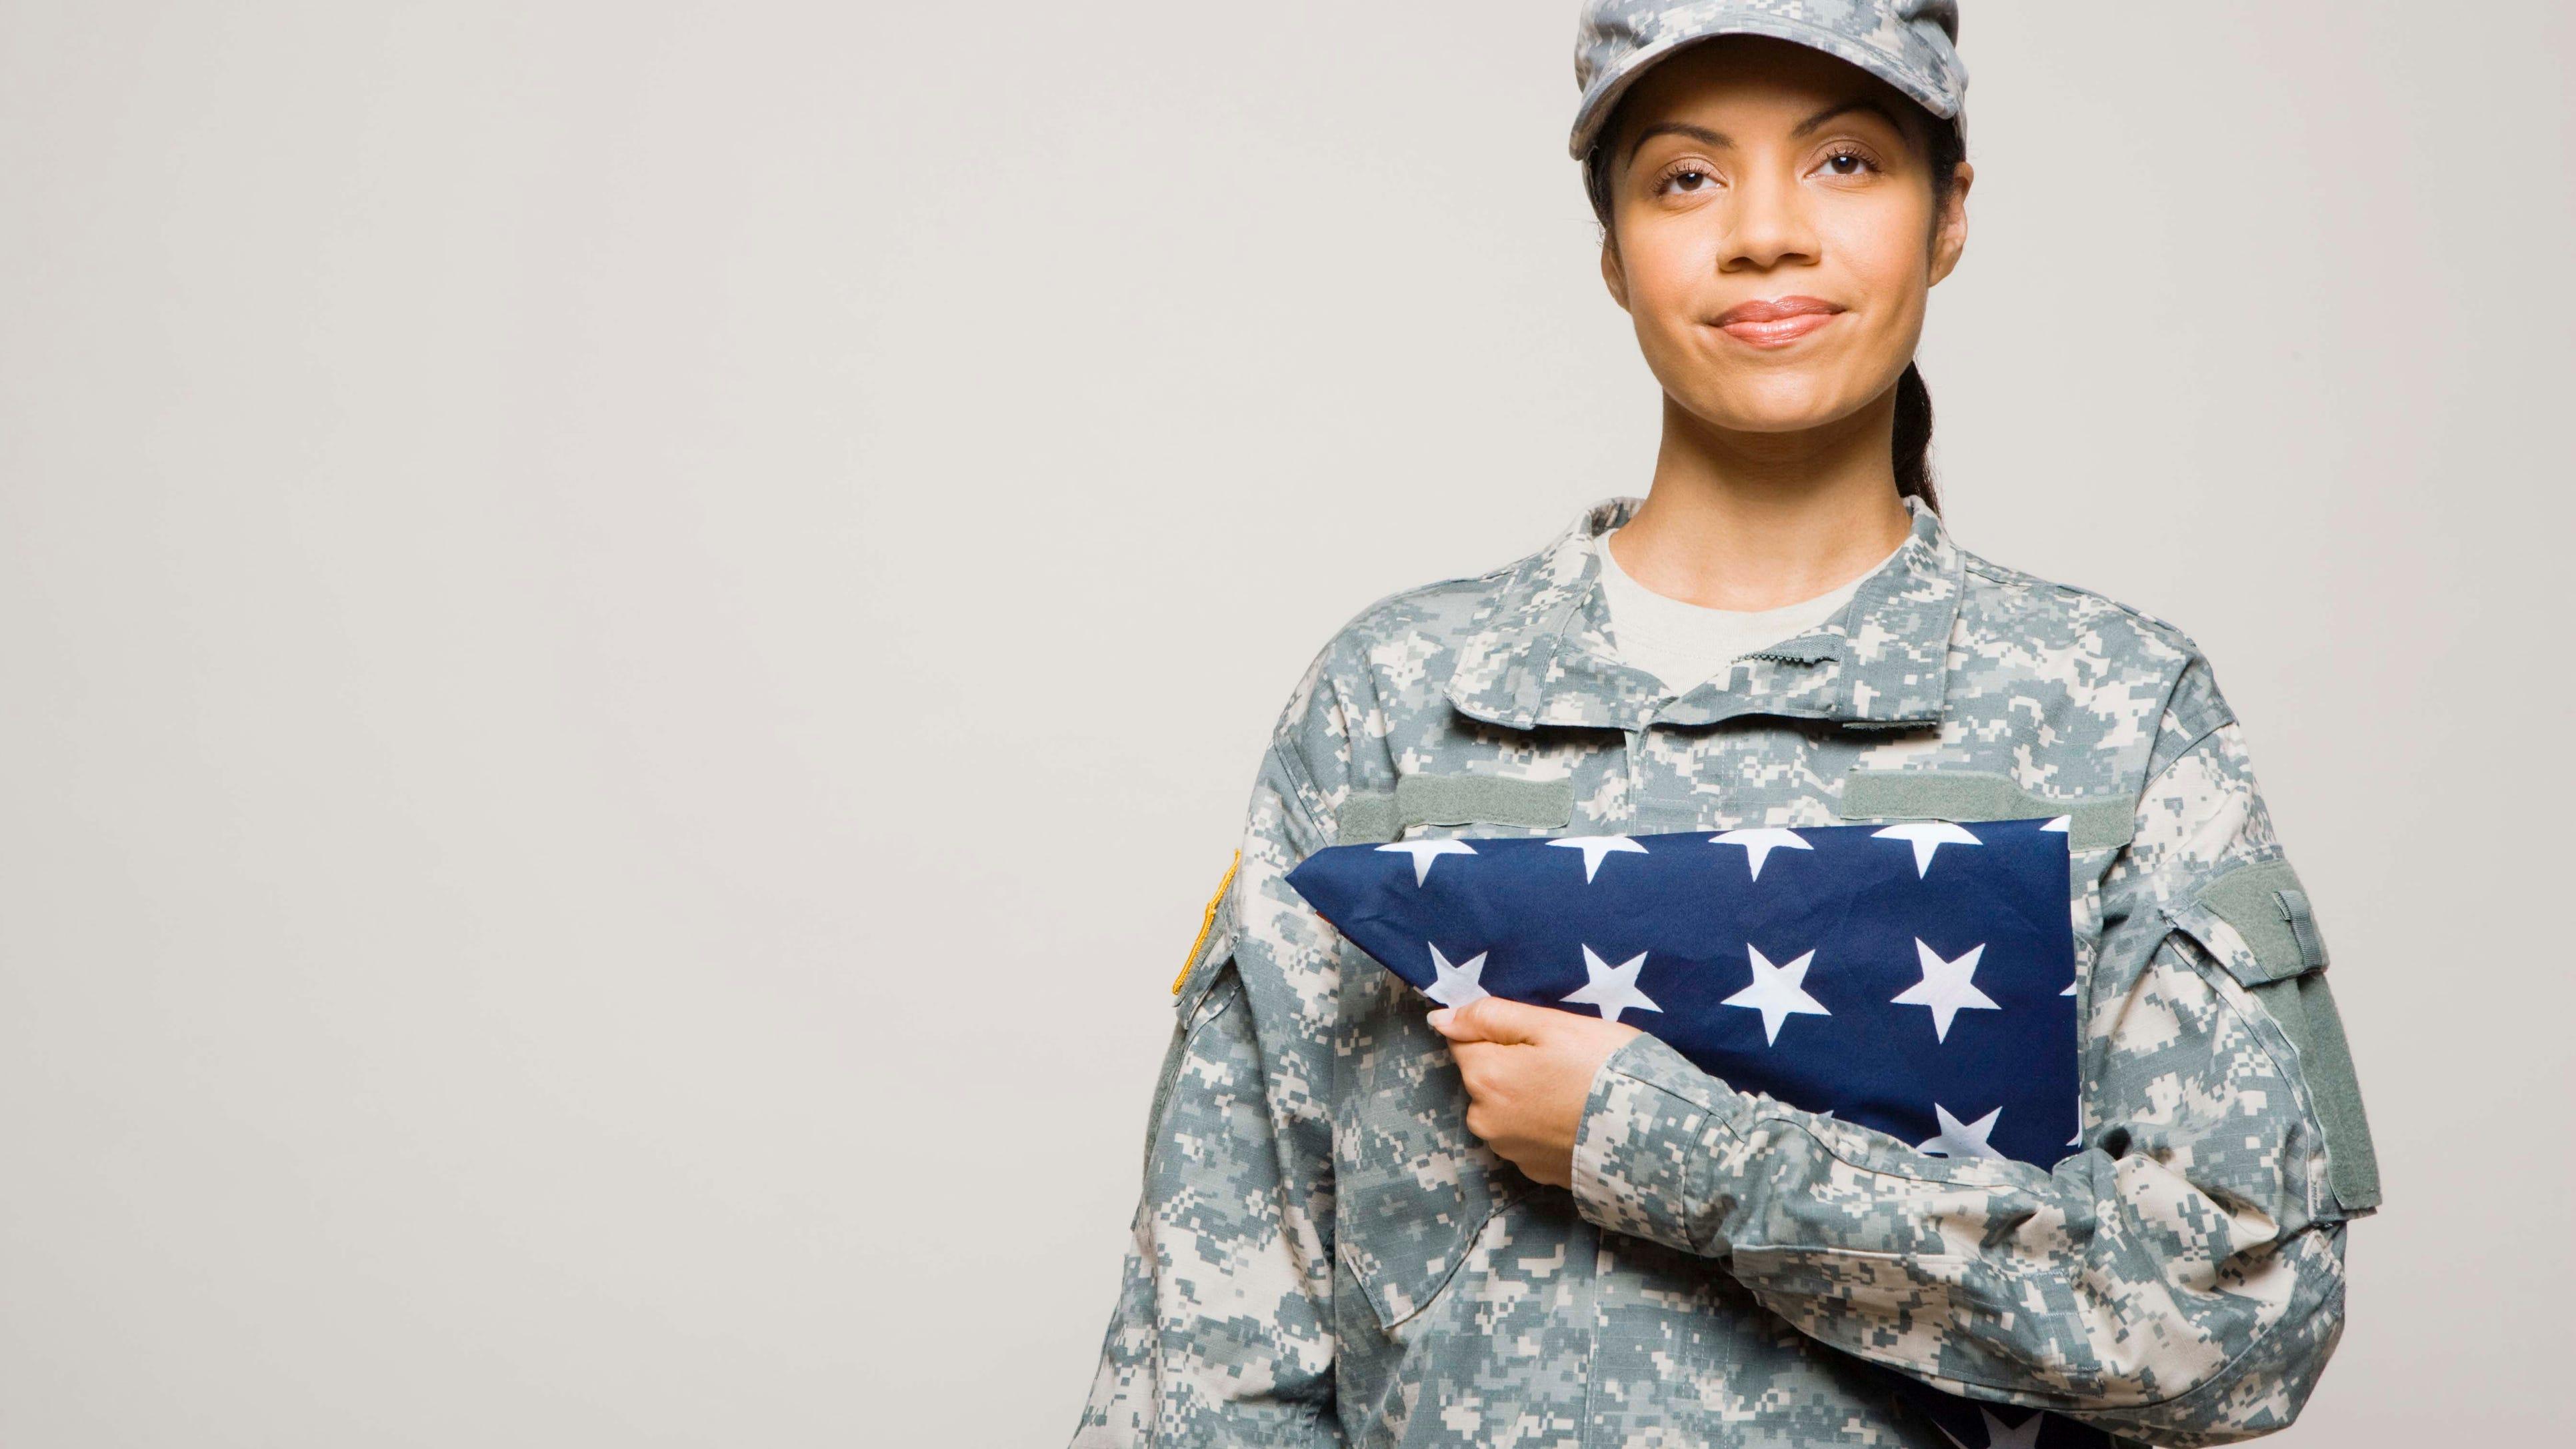 Military Women's Memorial wants to hear from women veterans